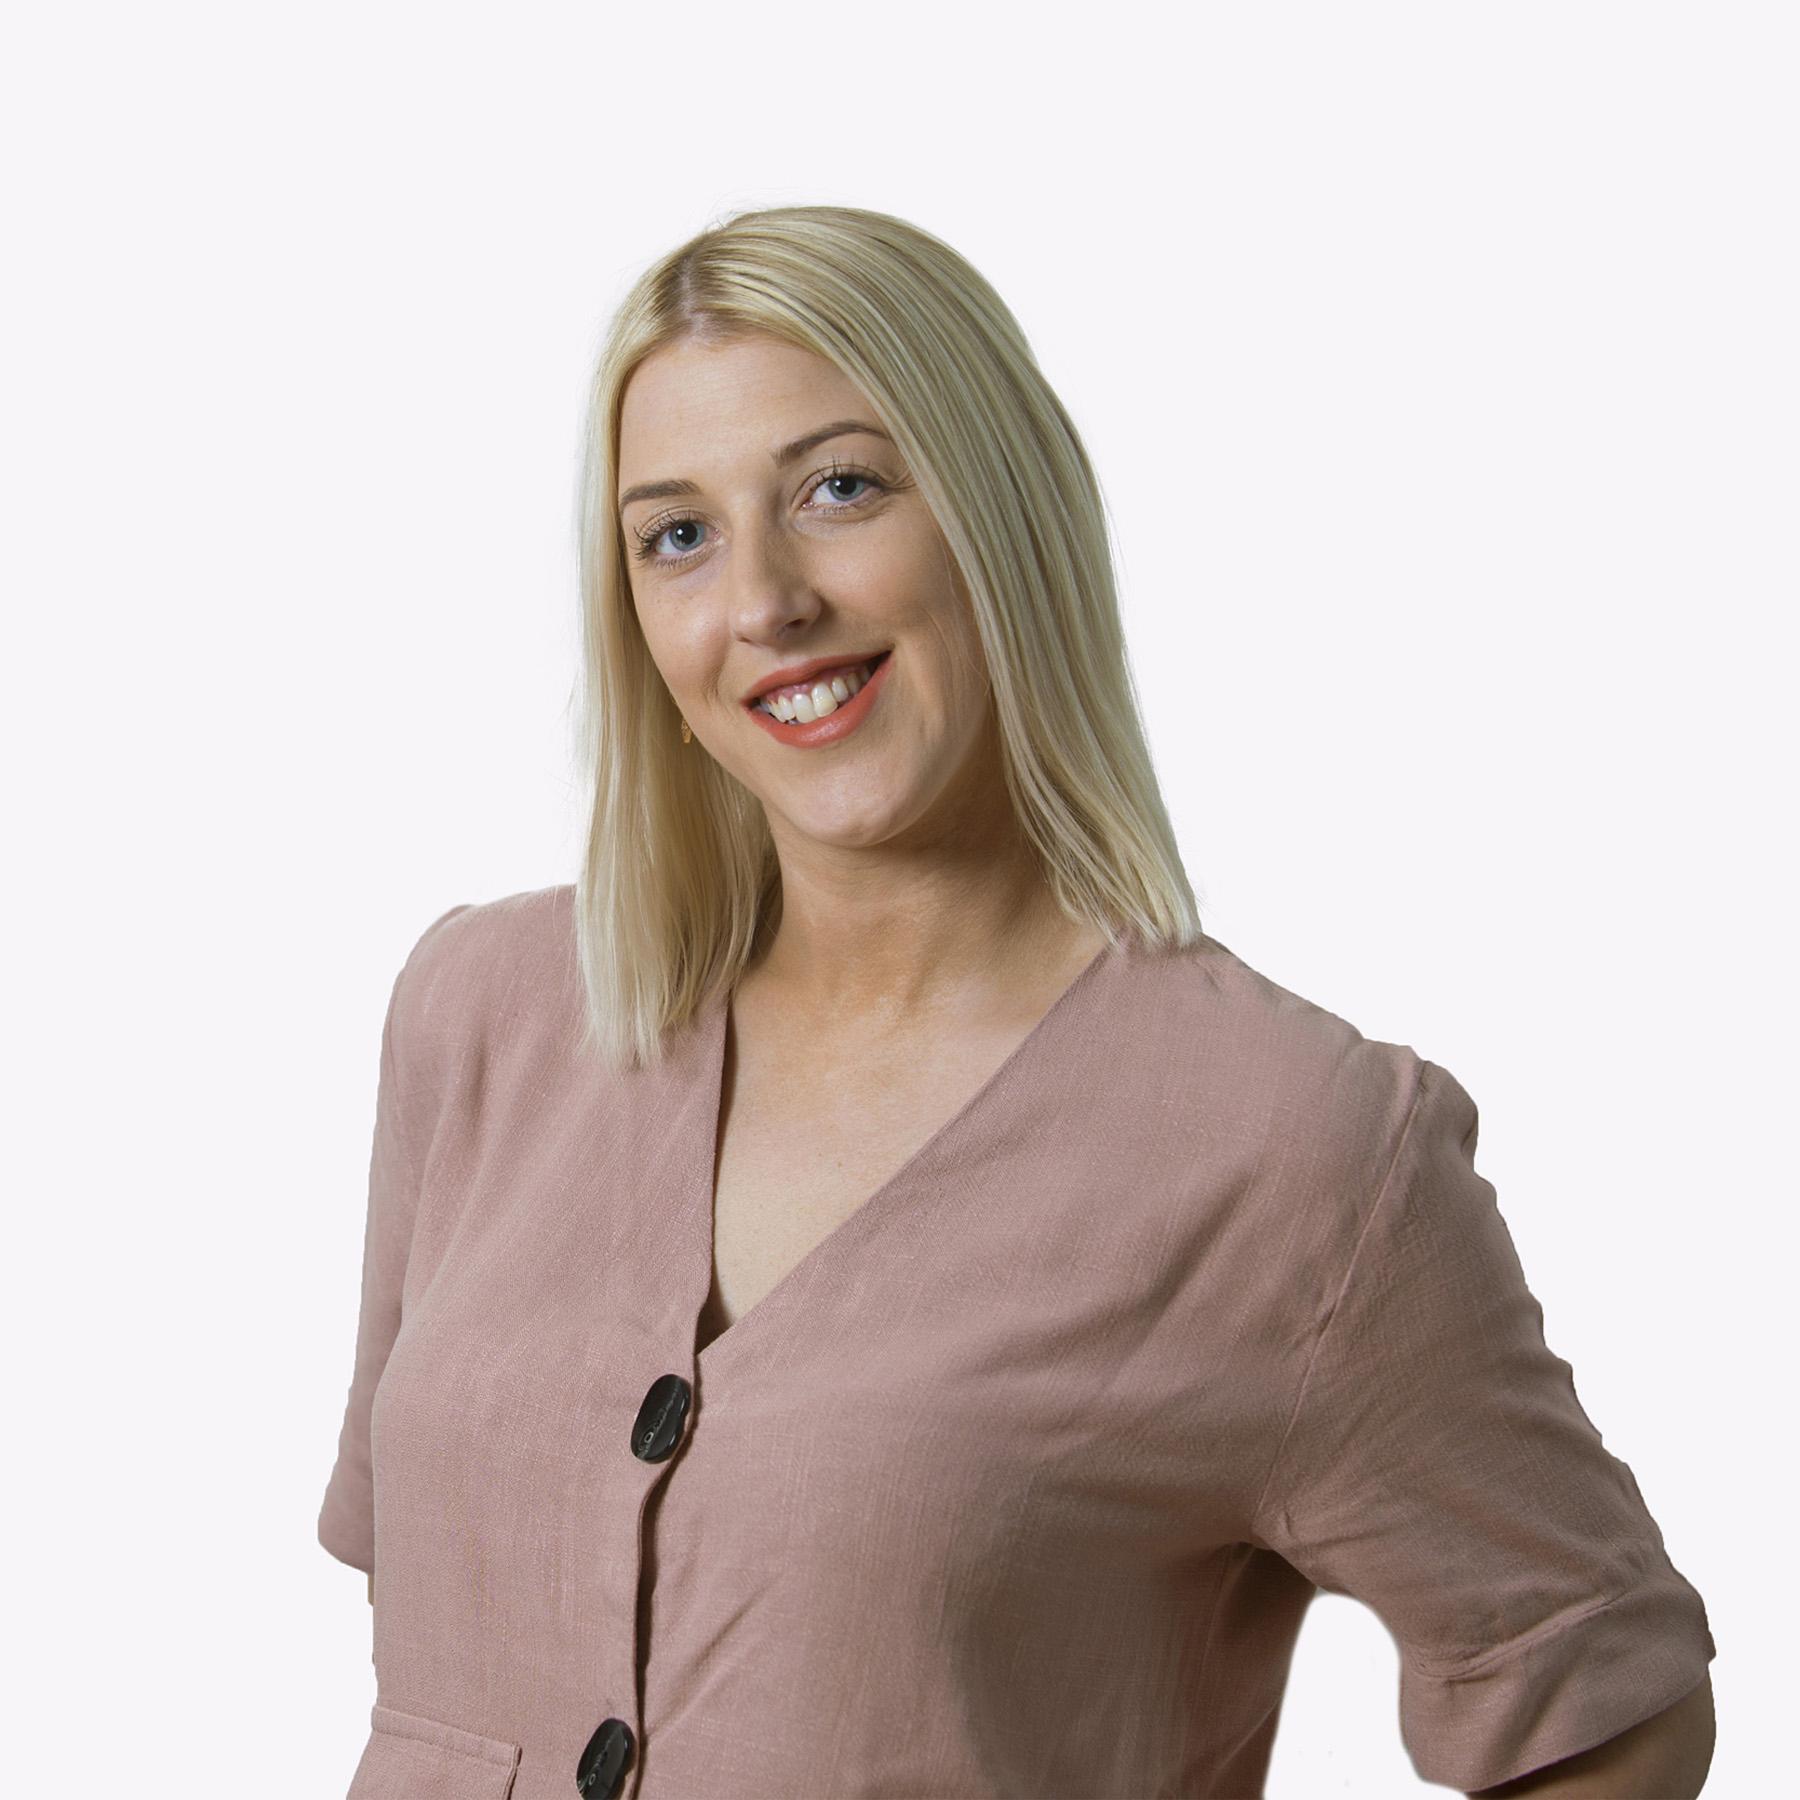 Kayleigh Penny